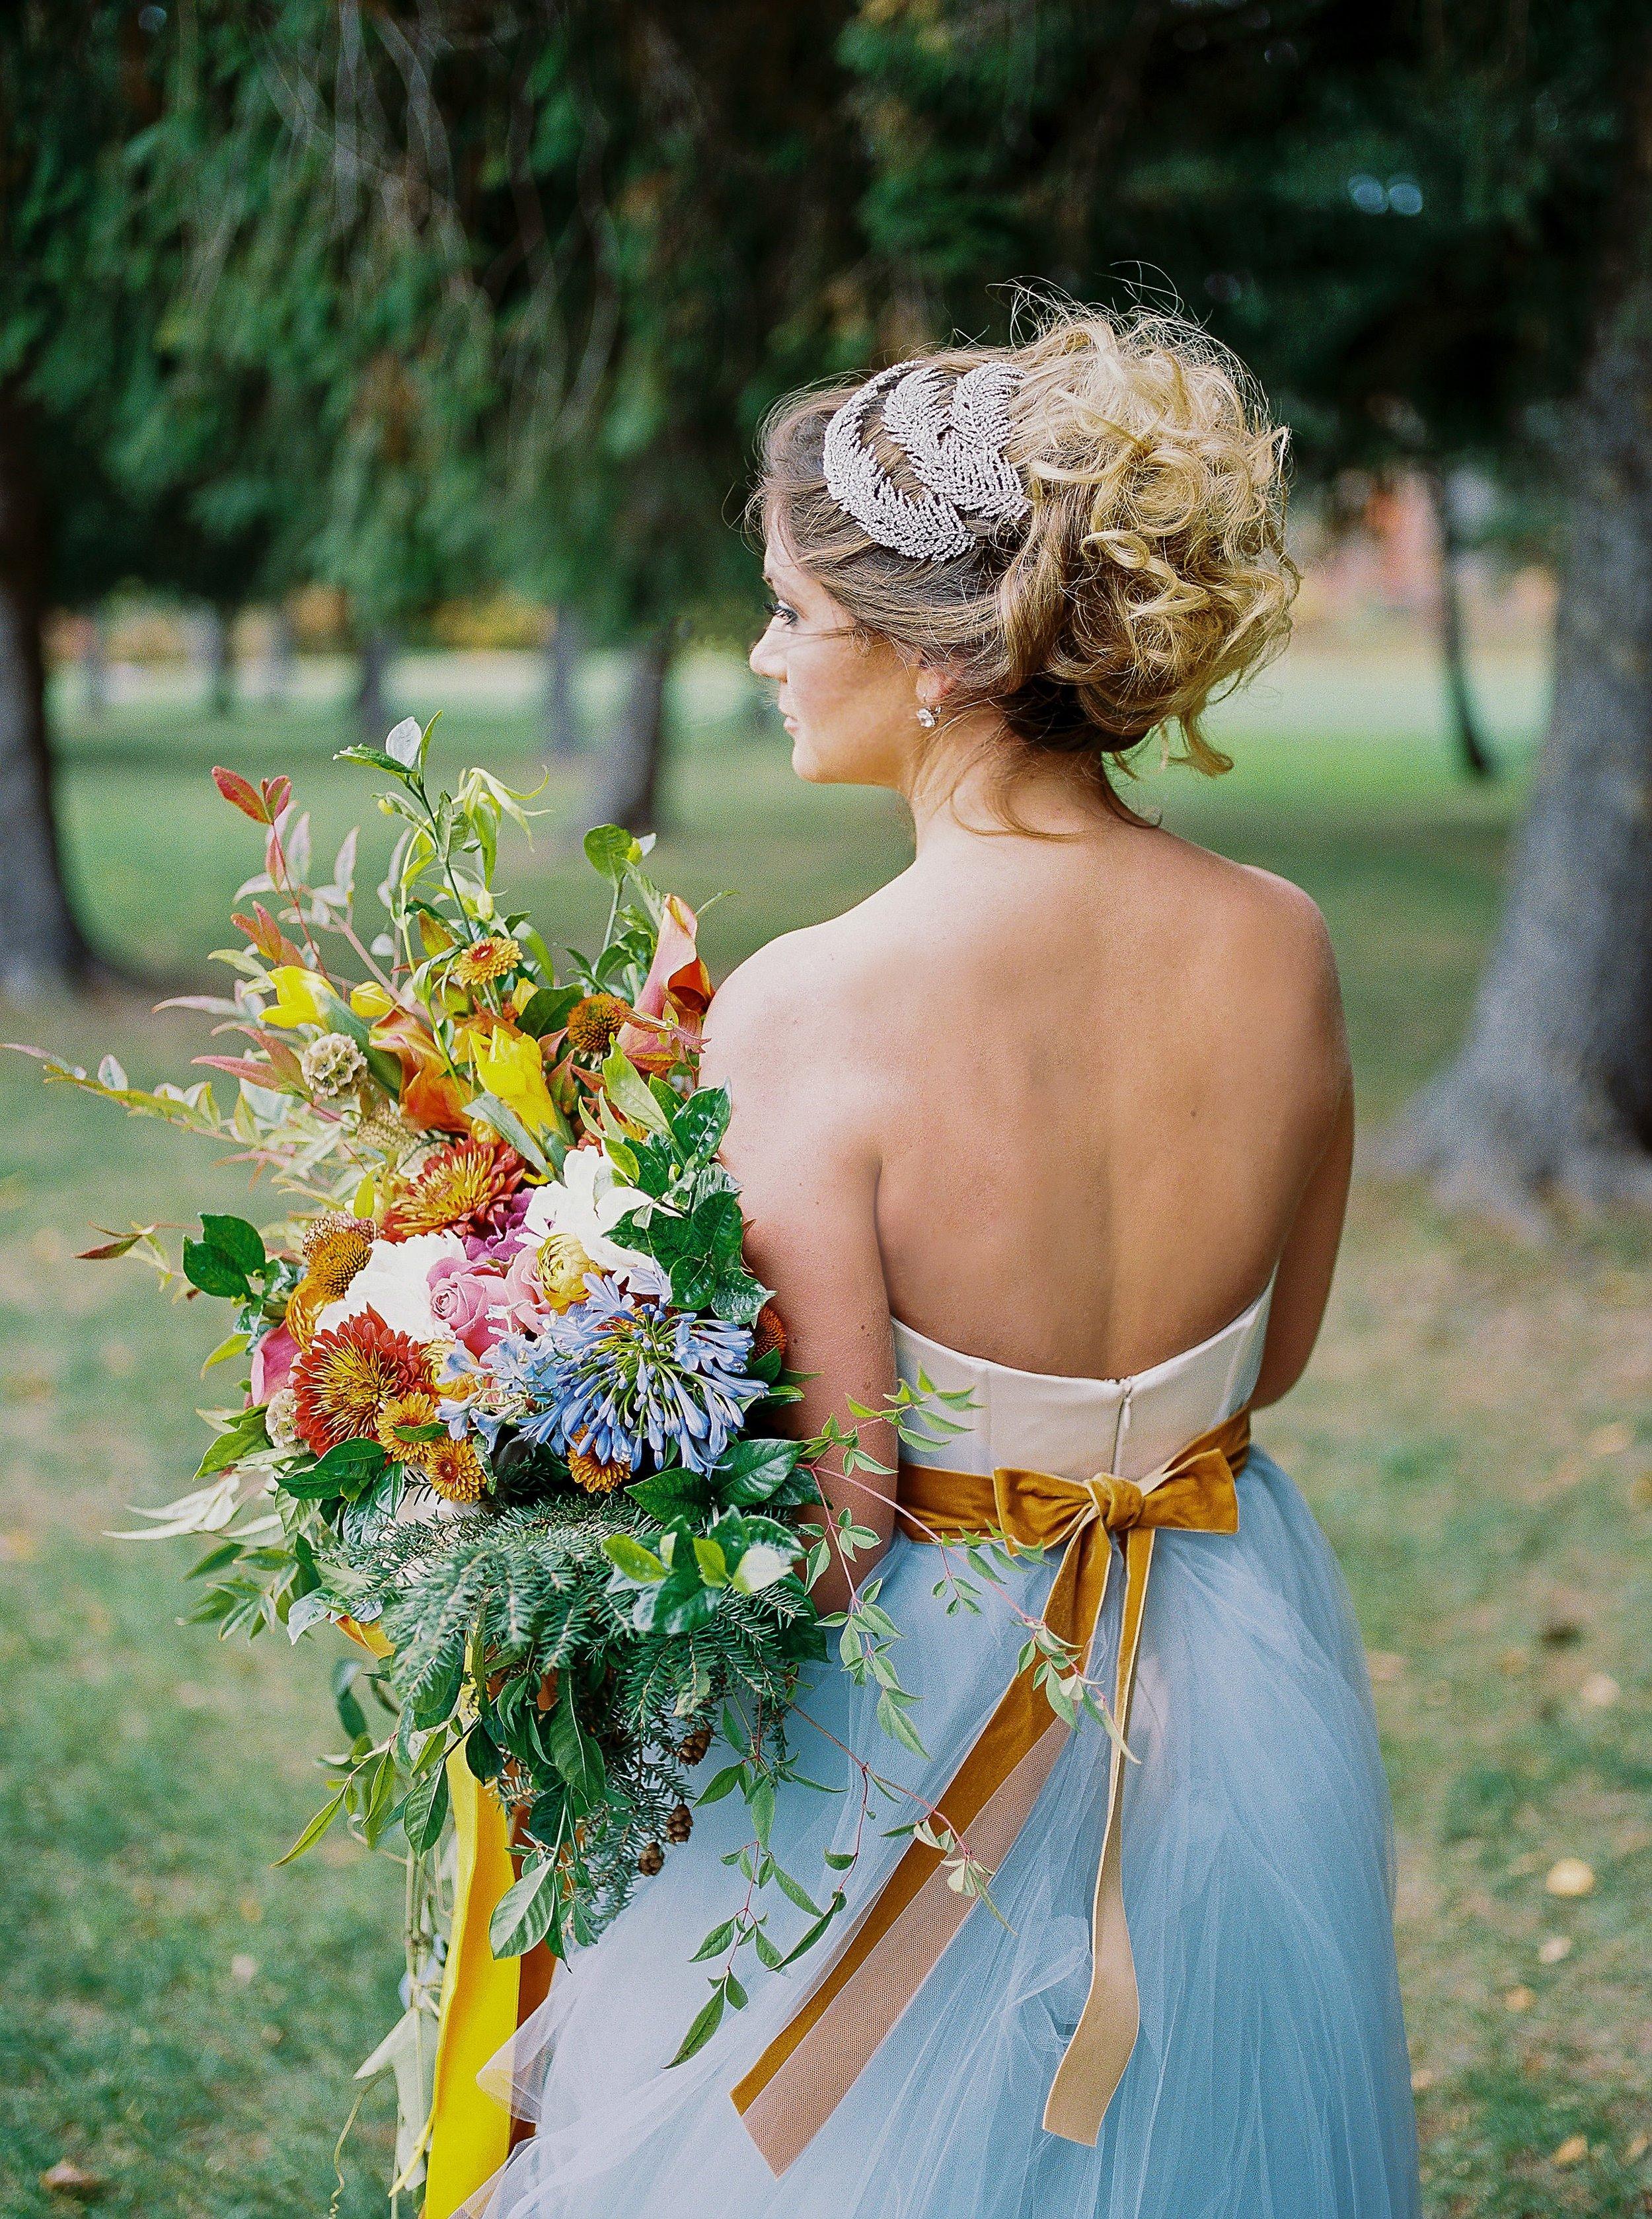 Alexandra-Elise-Photography-Ali-Reed-Film-Wedding-Photographer-Deerfield-Country-Club-078.jpg